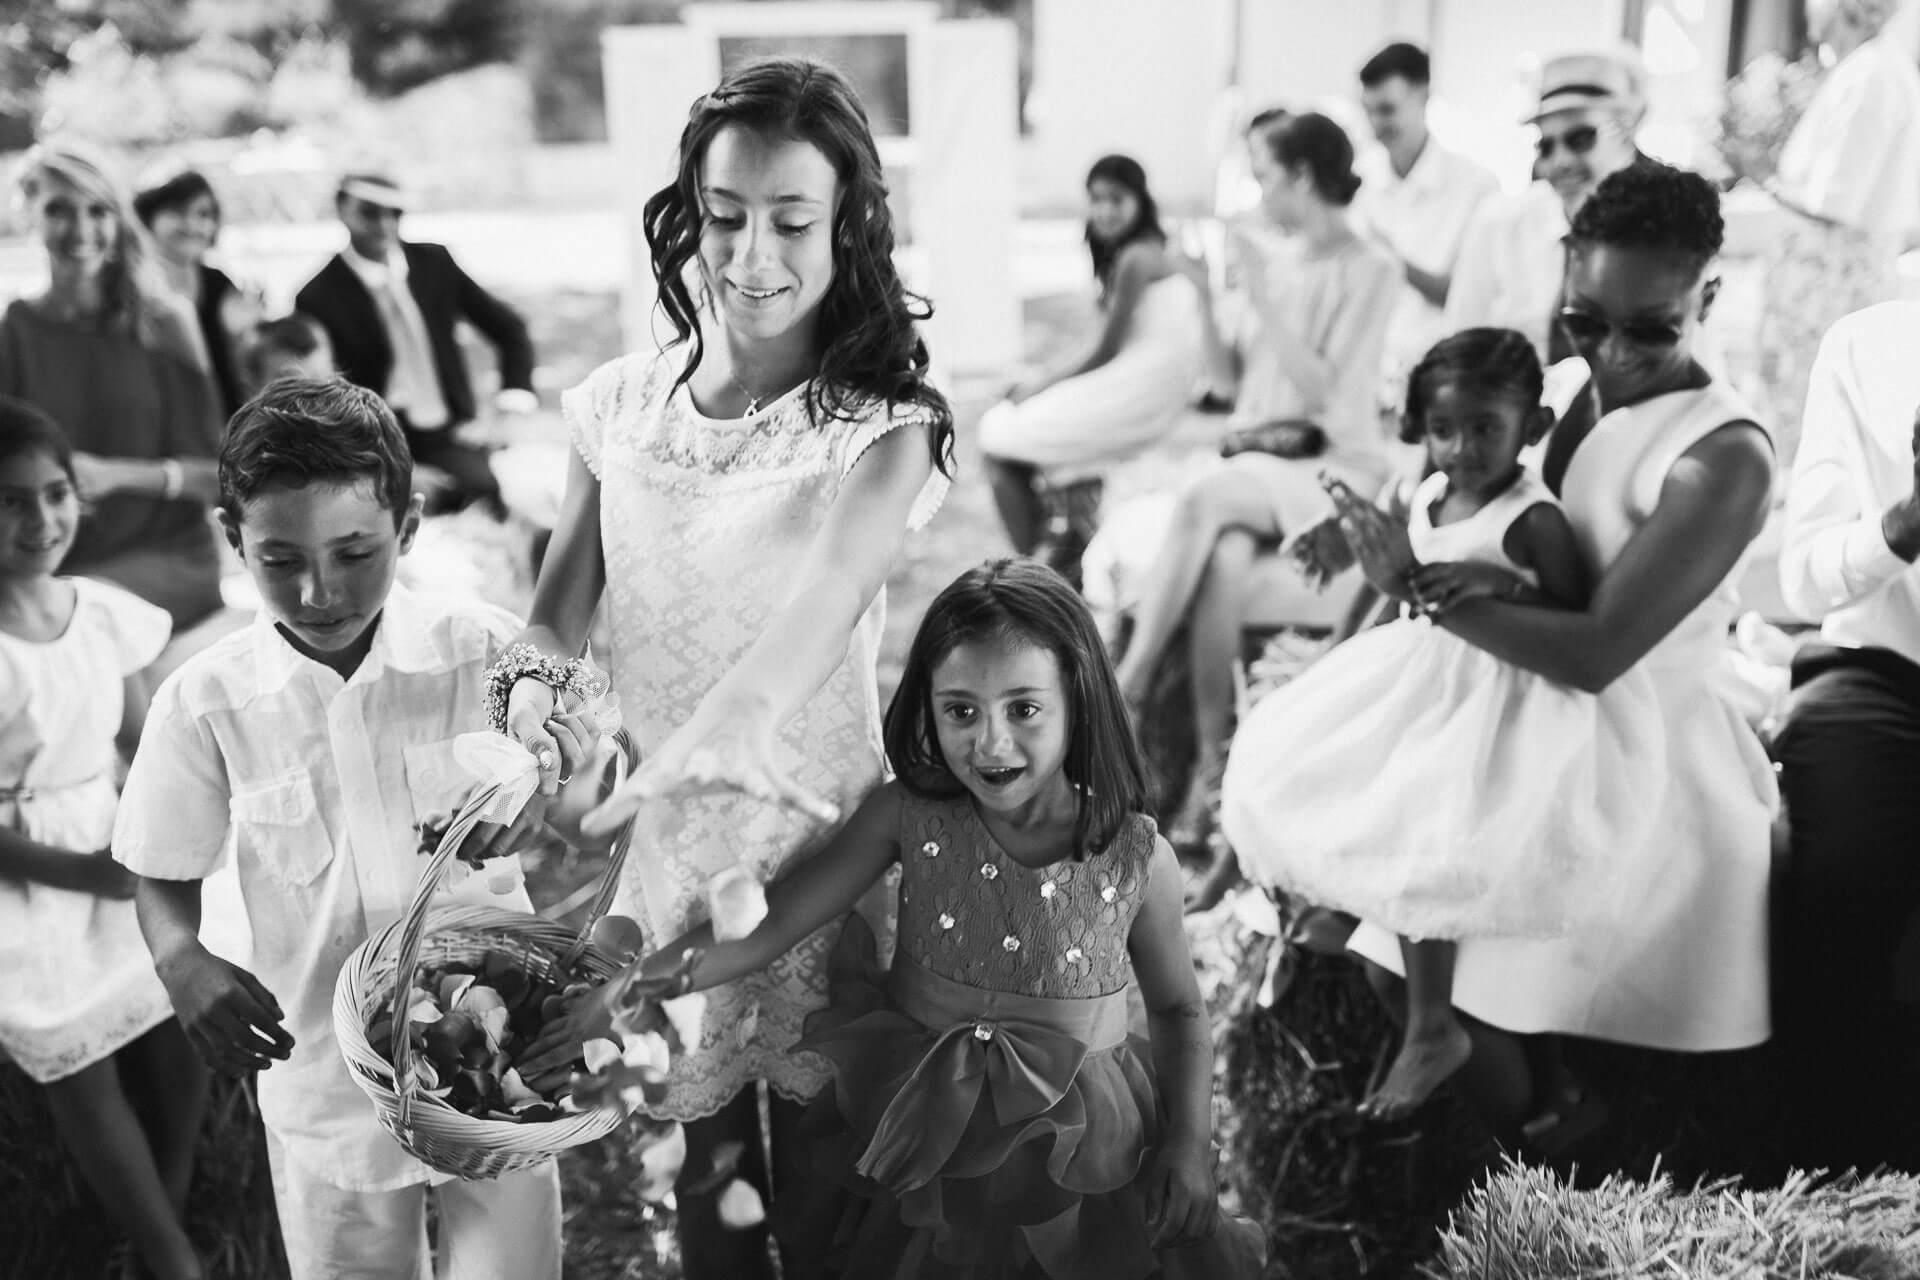 photographe-mariage-aix-en-provence-stephanie-jerome-9